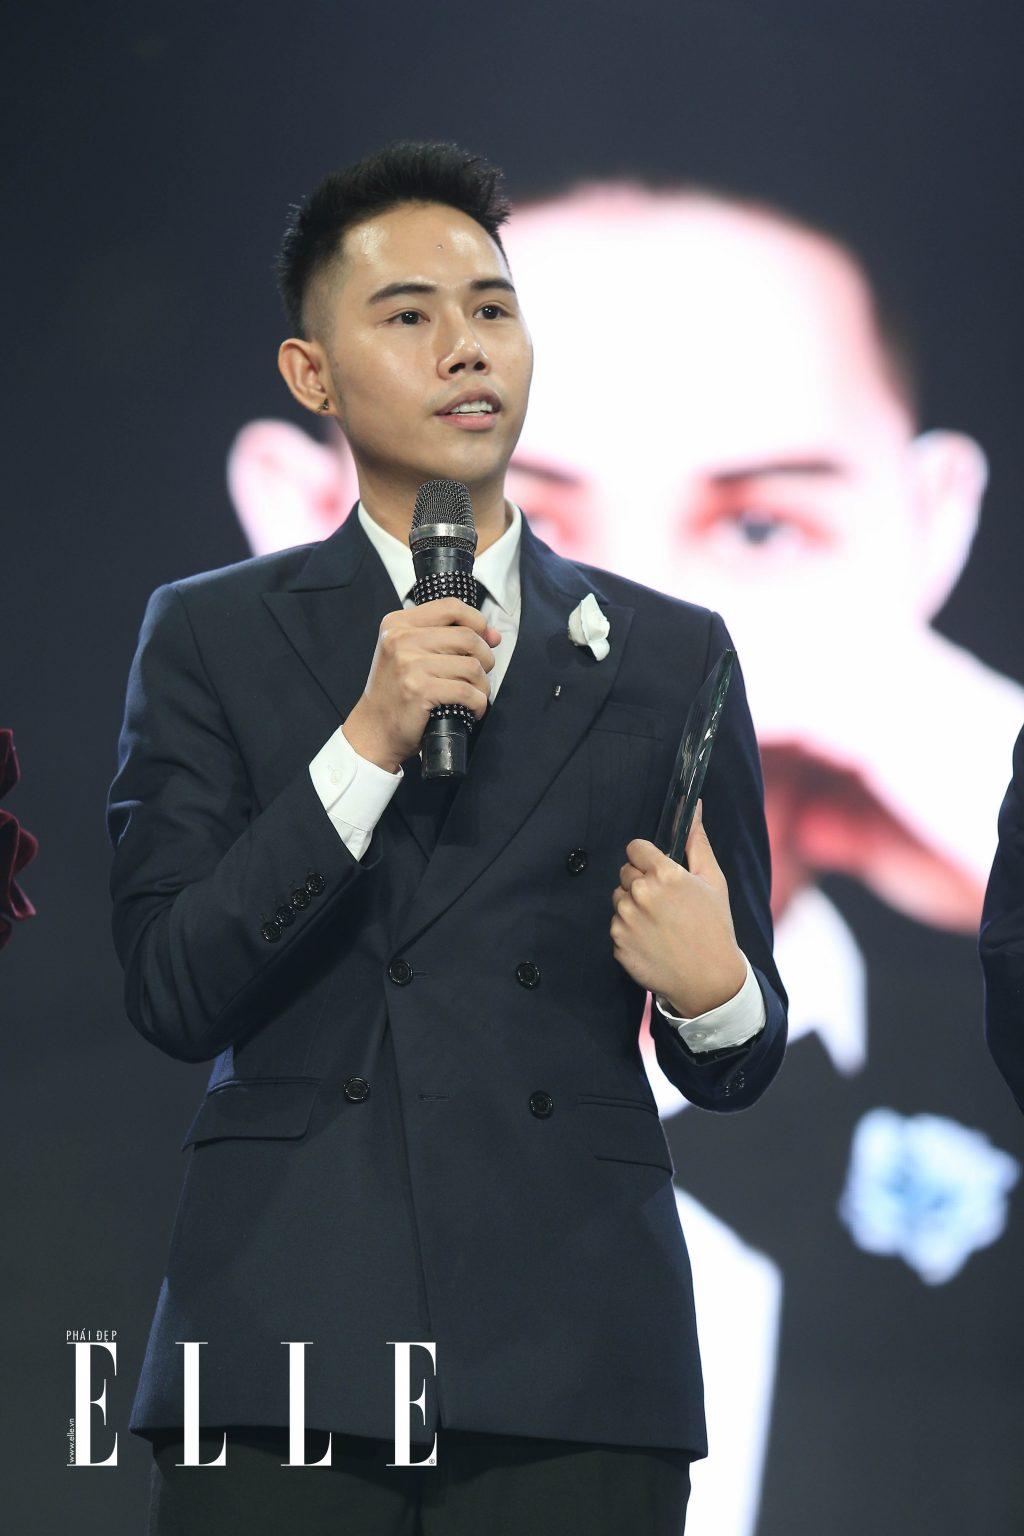 elle style awards 2018 lâm gia khang nhận giải